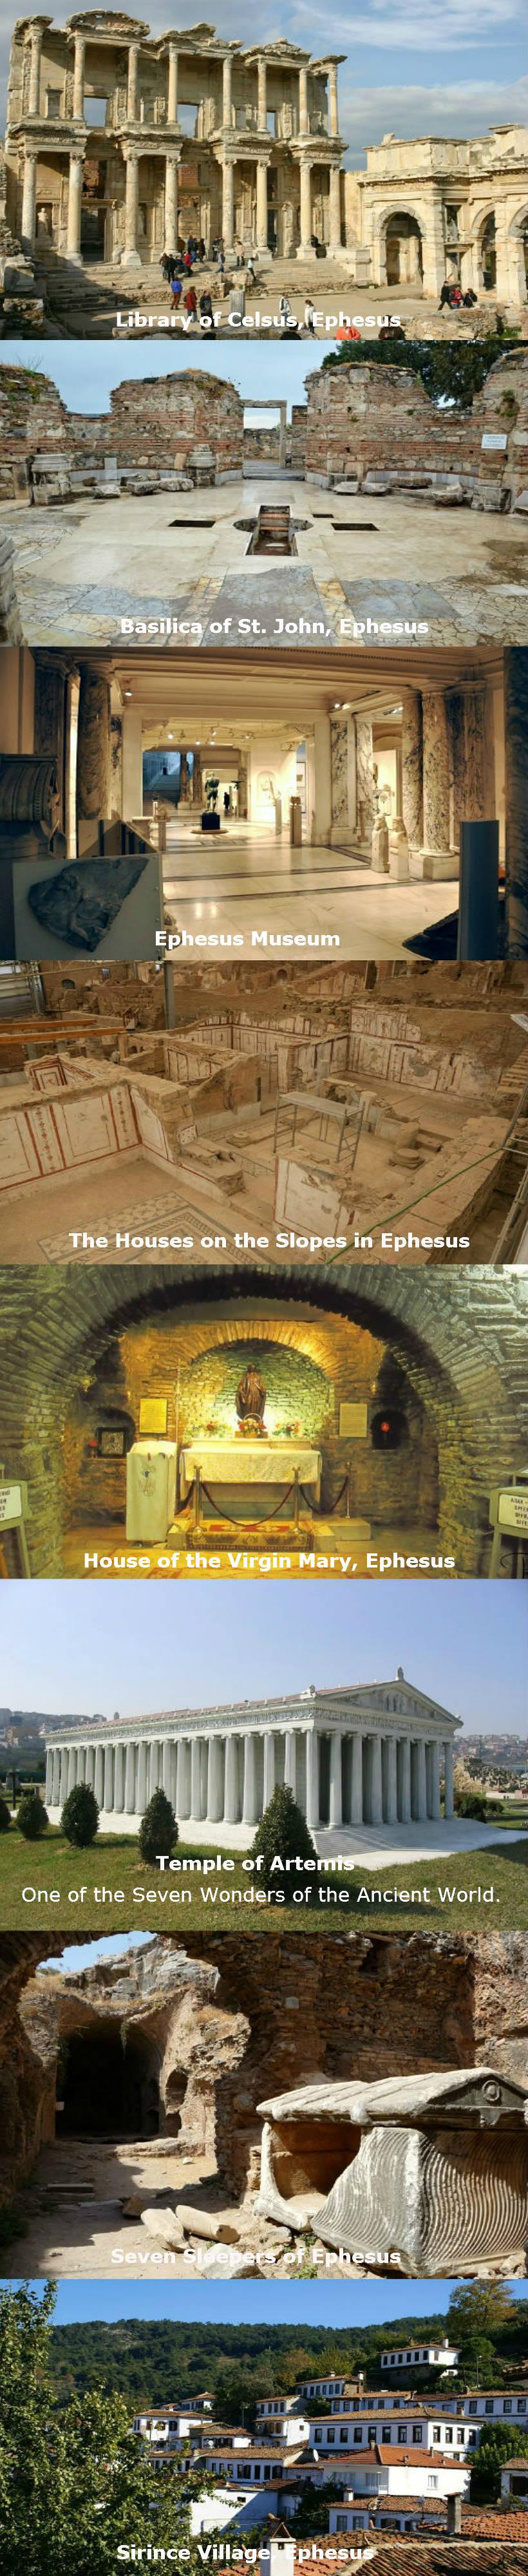 must see in ephesus tours from kusadasi